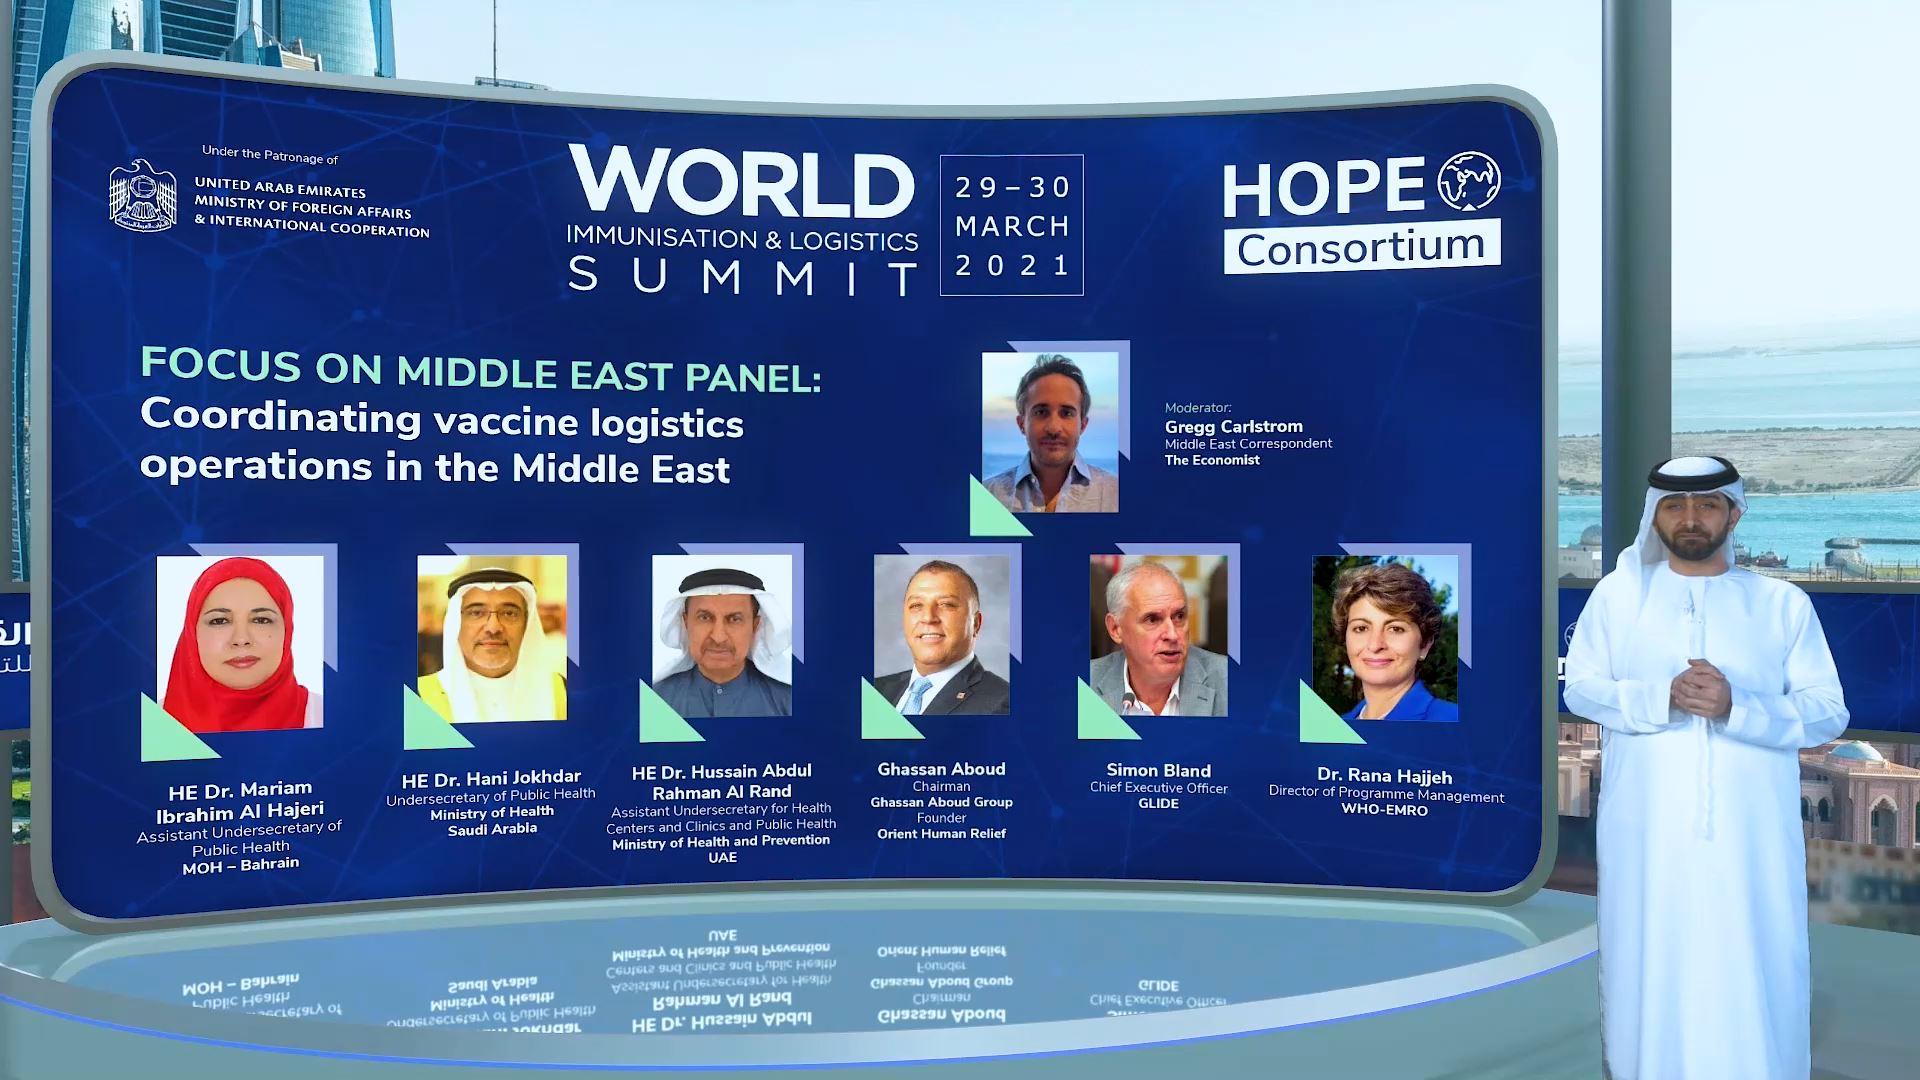 hope consortium world immunization and logistics summit virtual exhibition speakers